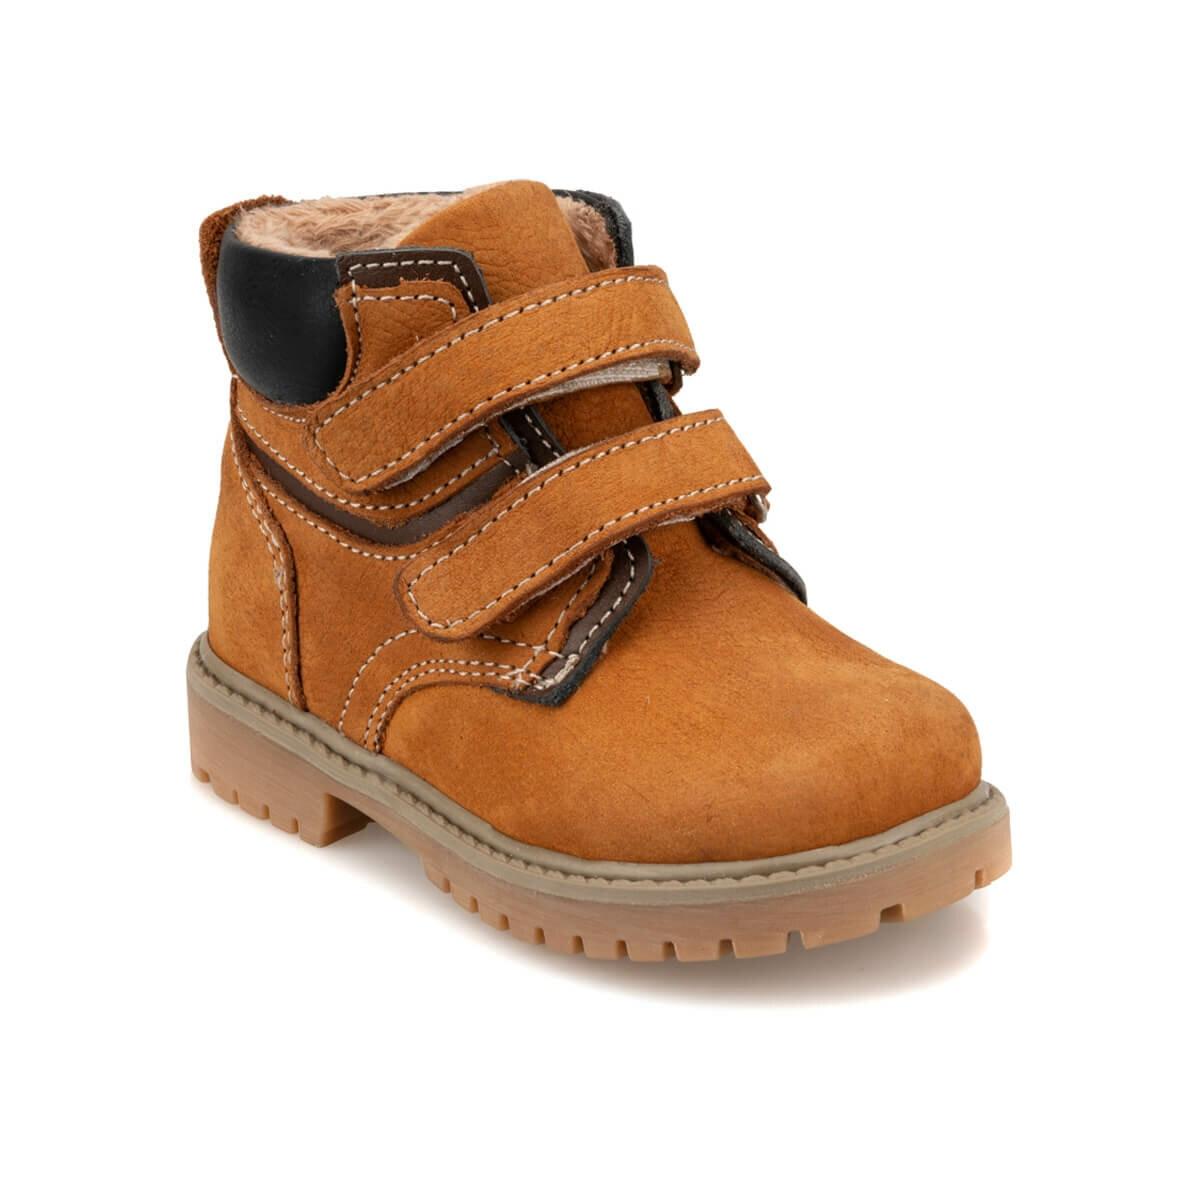 FLO 92.511734.B Camel Male Child Boots Polaris